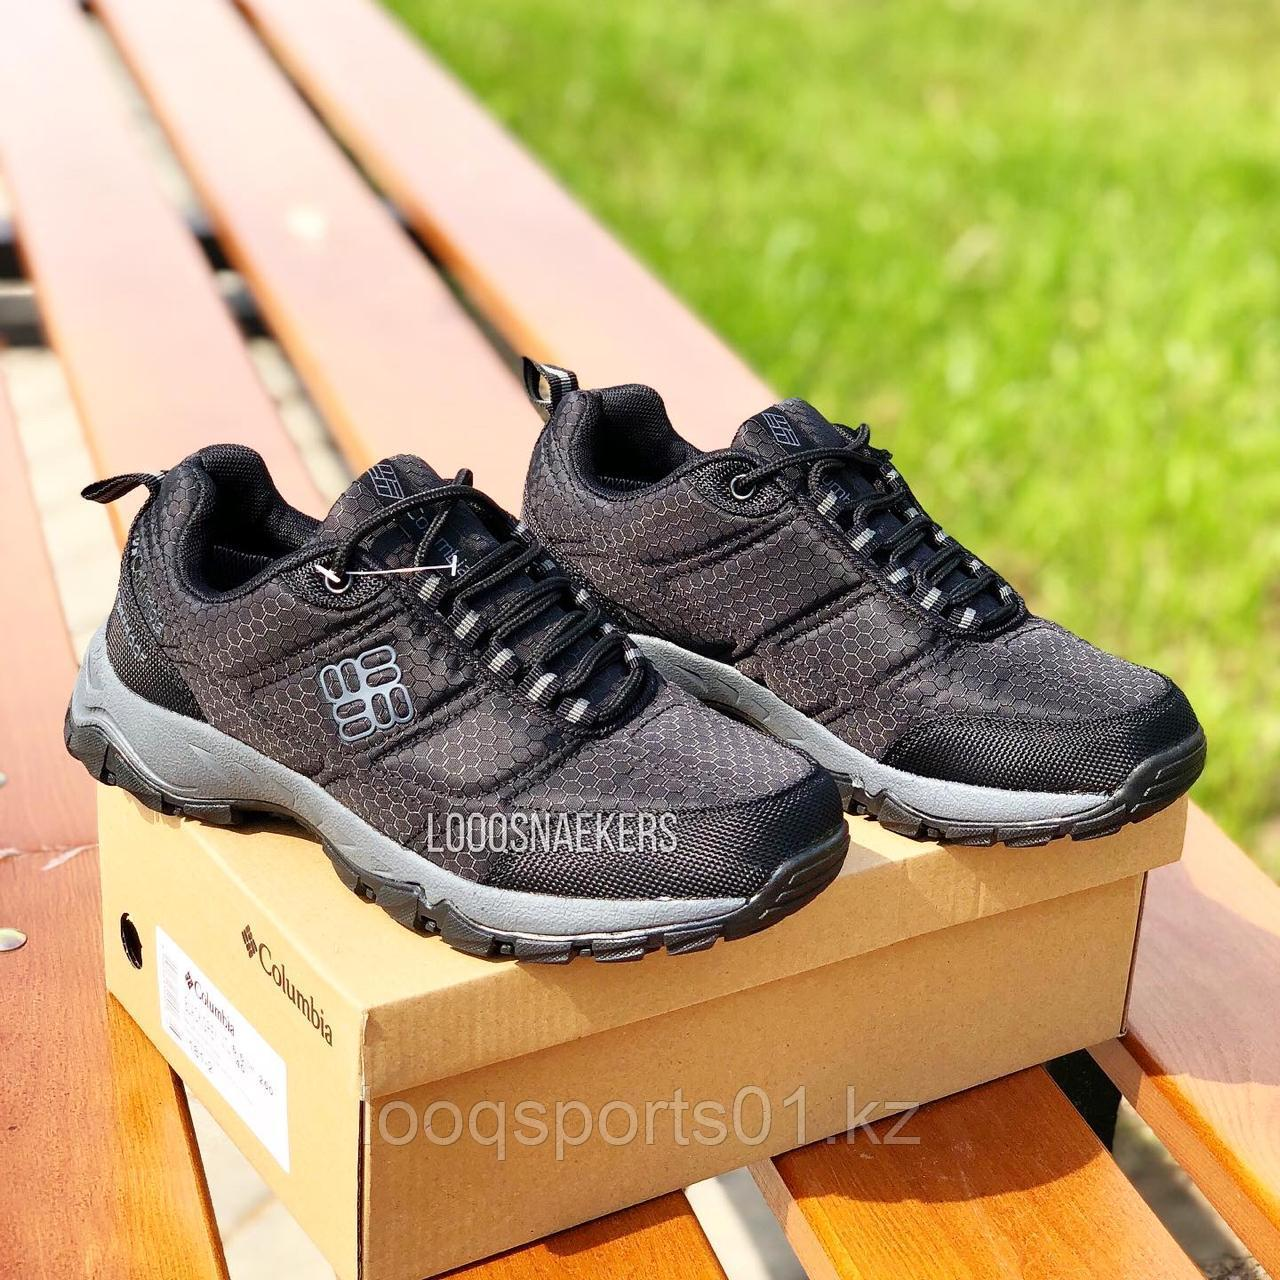 Мужские кроссовки ботинки термо (обувь) Columbia (1812)